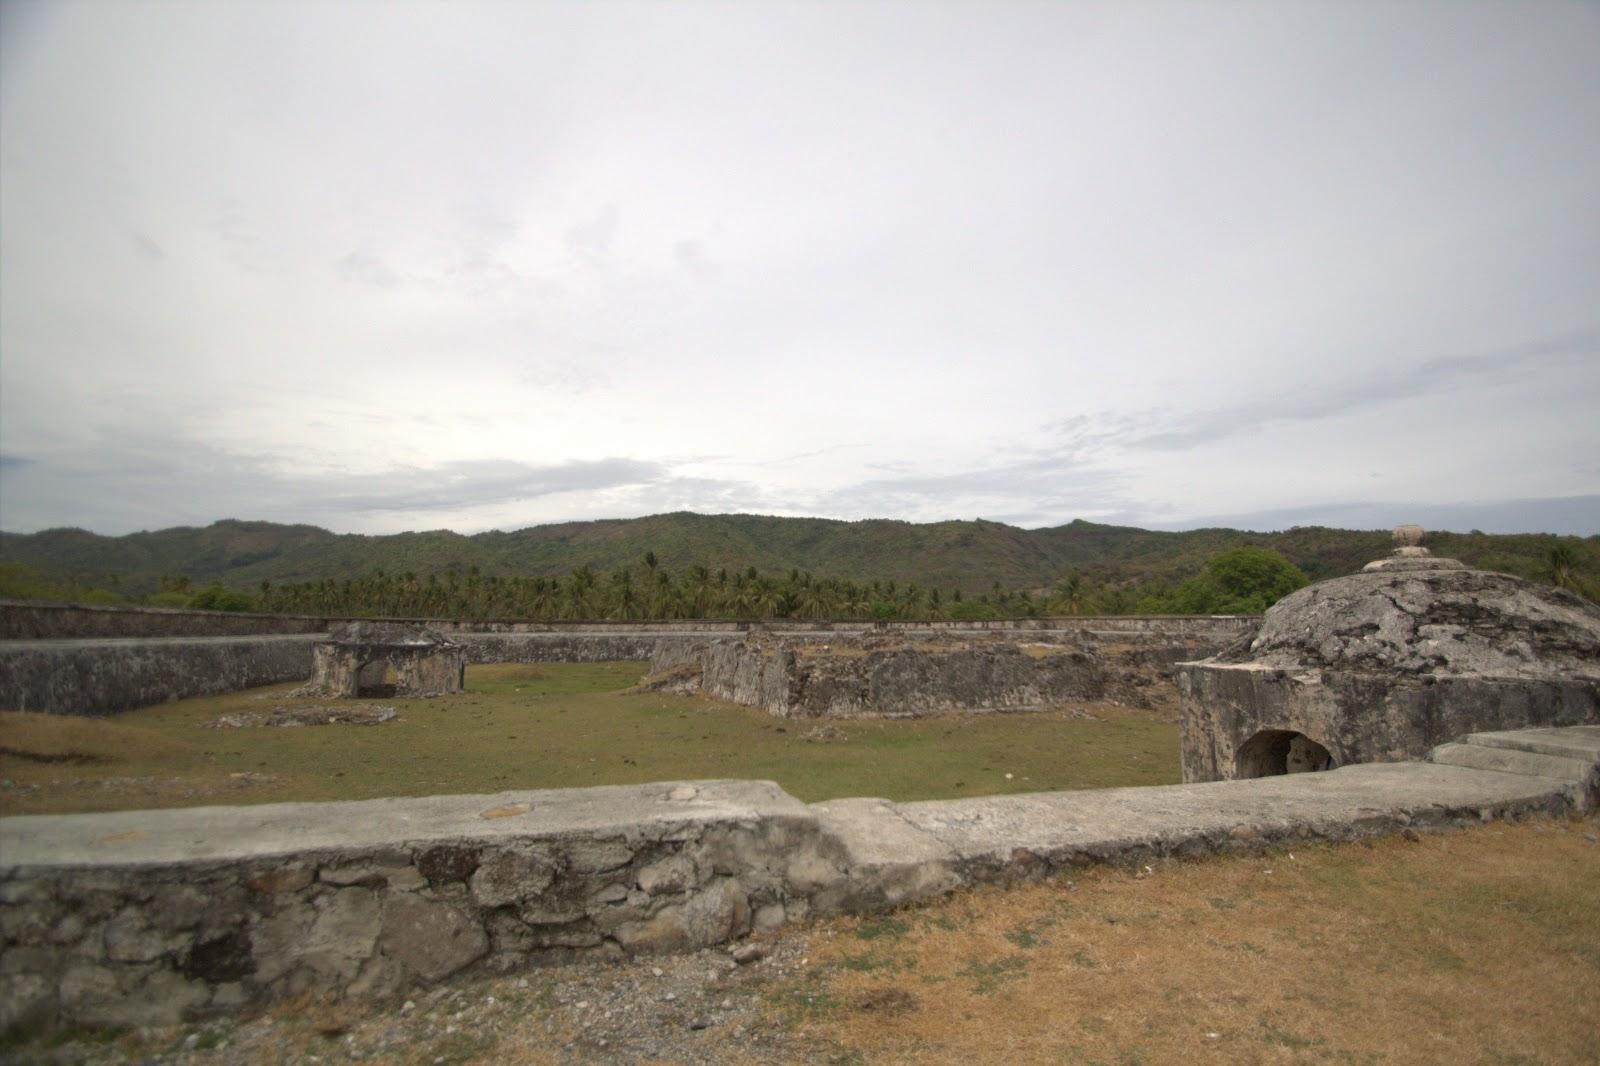 Benteng Indra Patra Fardhan Blog Sekitar Pantai Ujung Batee Tepatnya